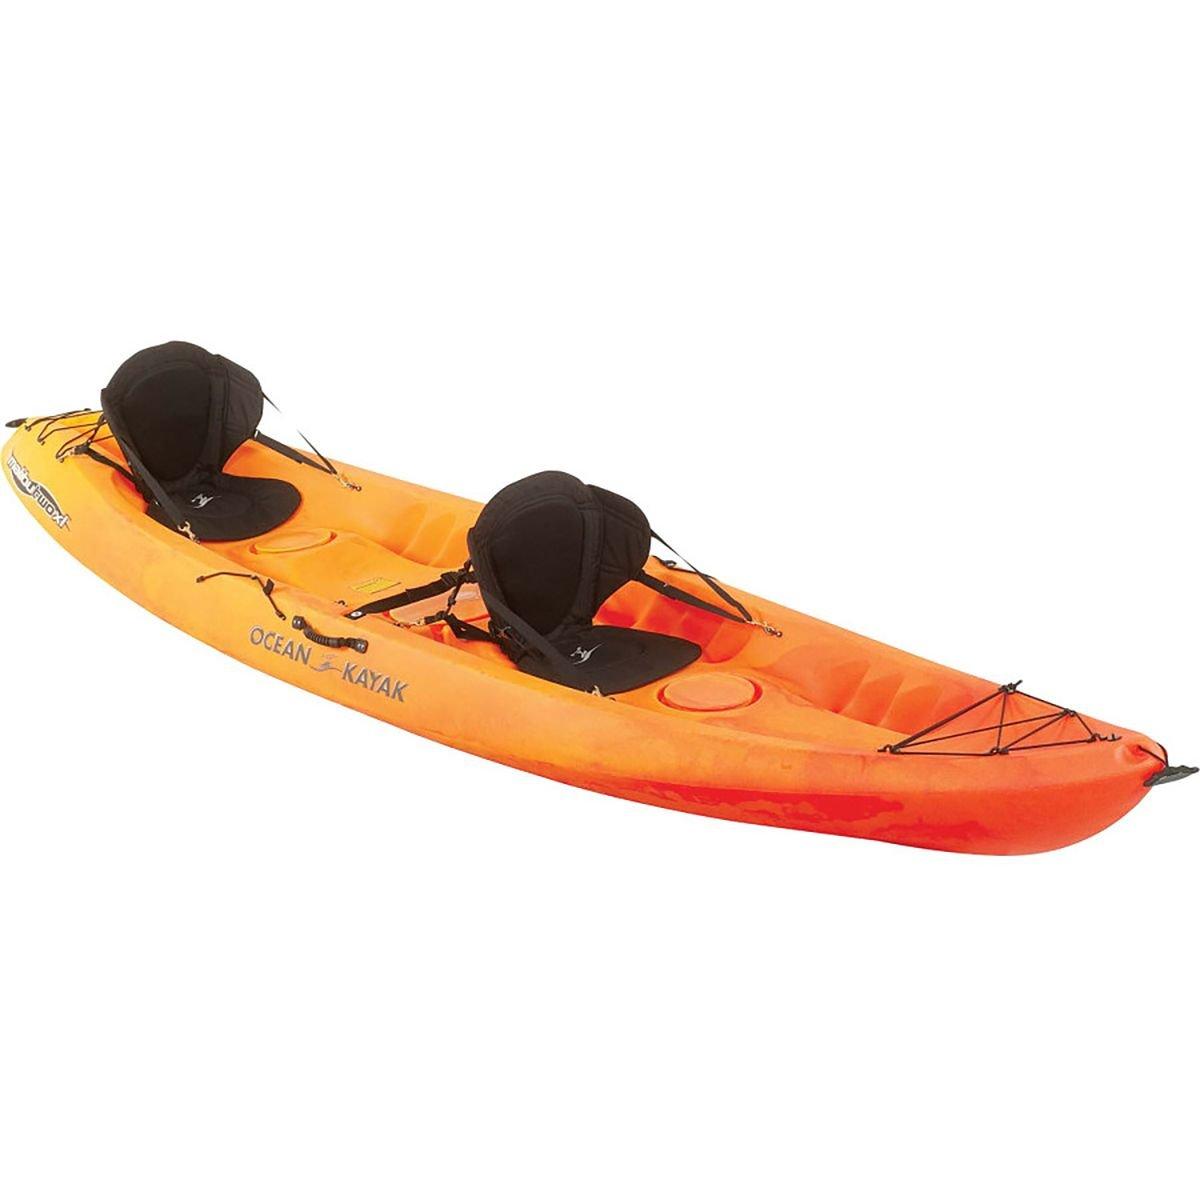 Ocean Kayak Malibu Two XL, Tandem Kayak